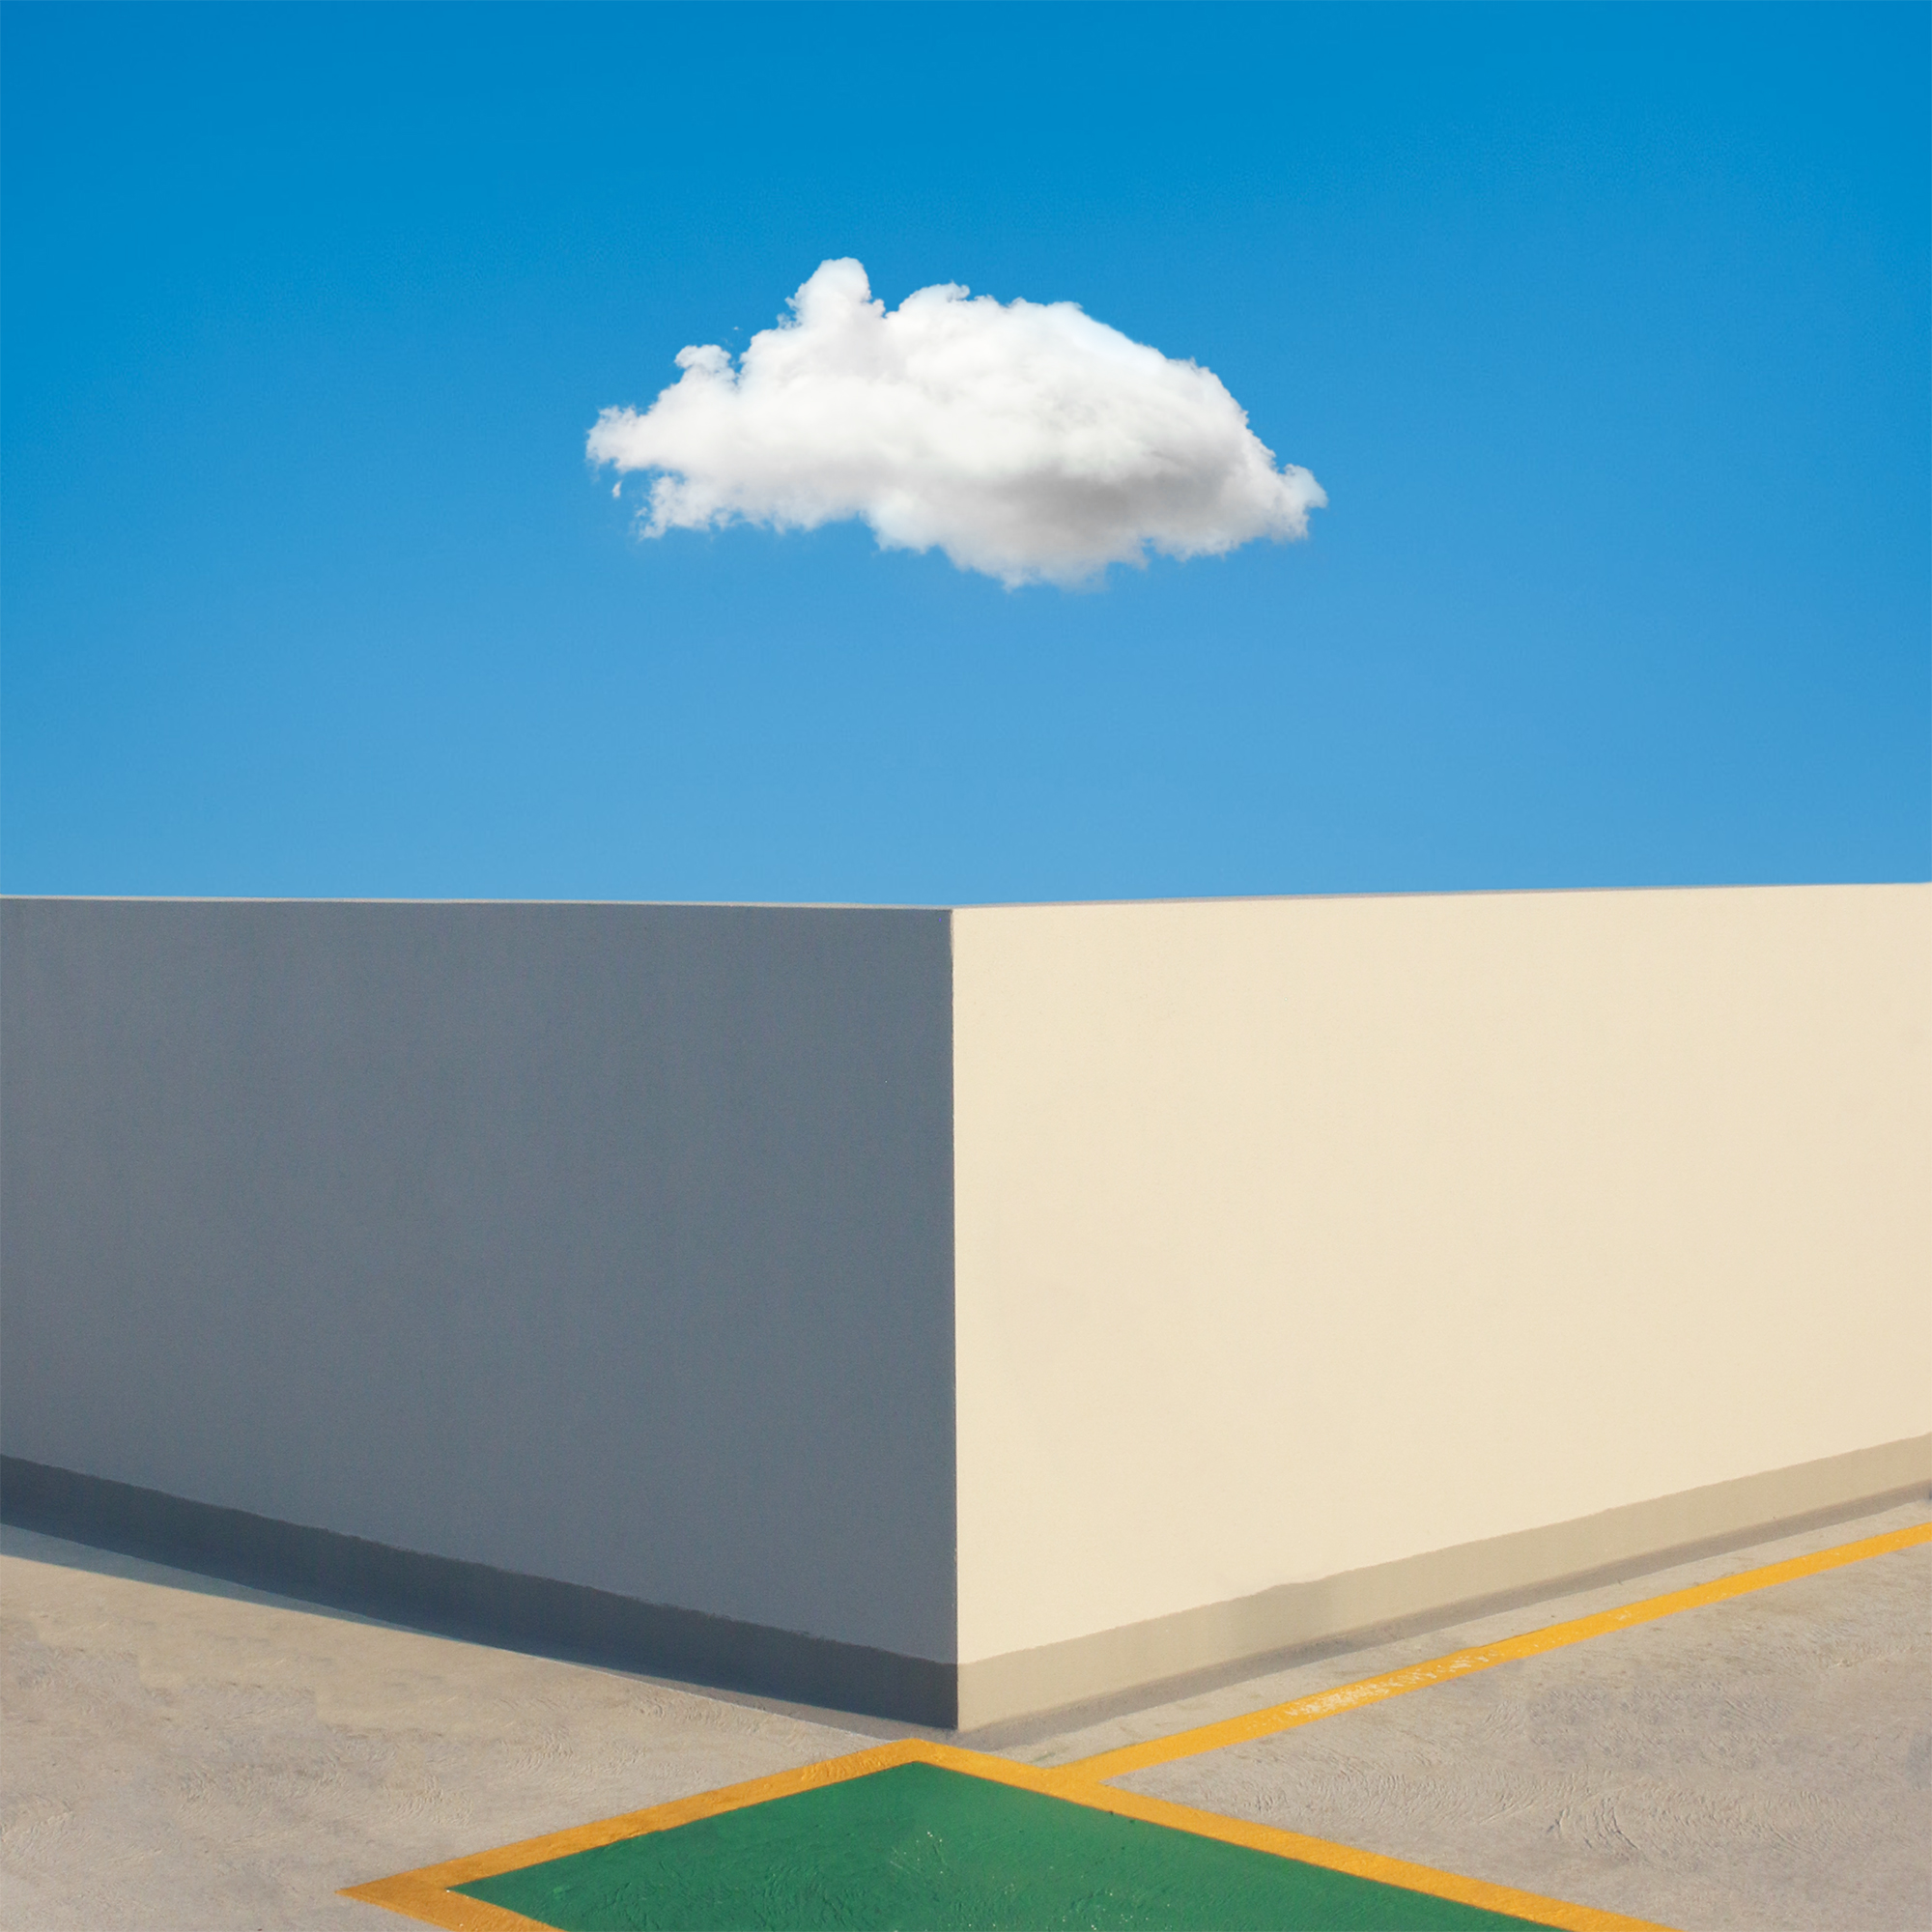 parking lot cloud.jpg